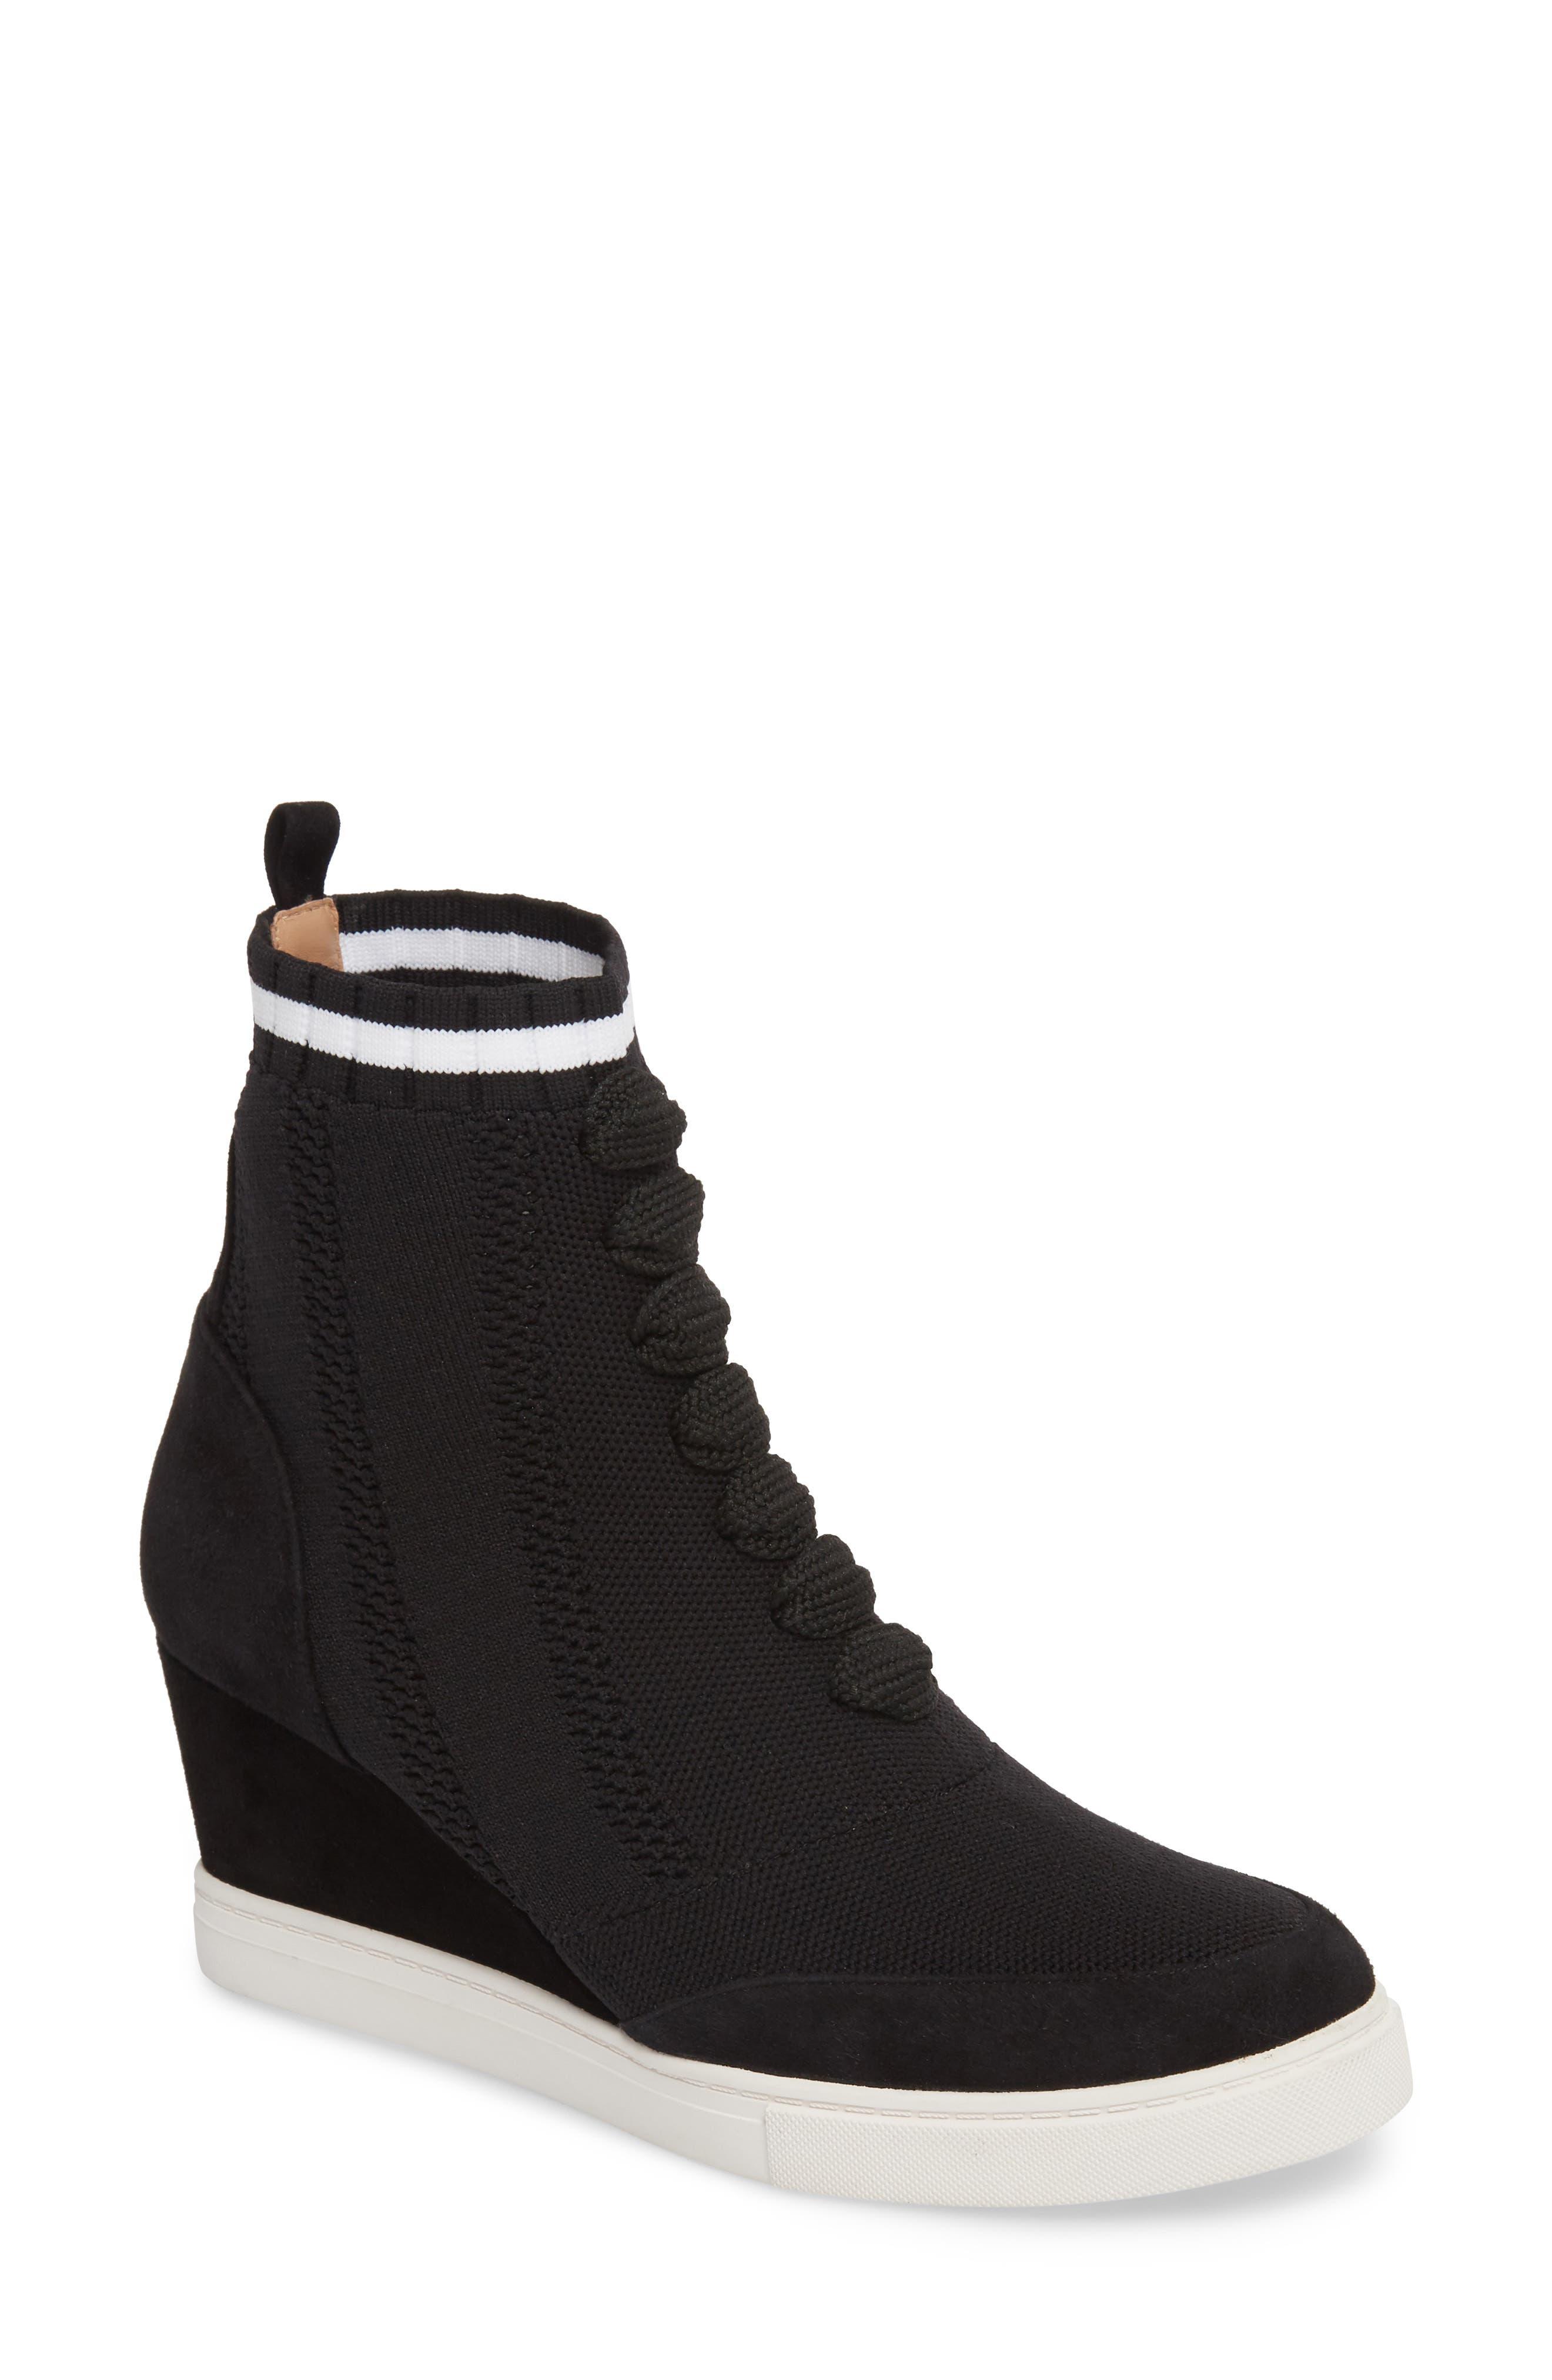 LINEA PAOLO Fabiana Wedge Sneaker, Main, color, BLACK SUEDE